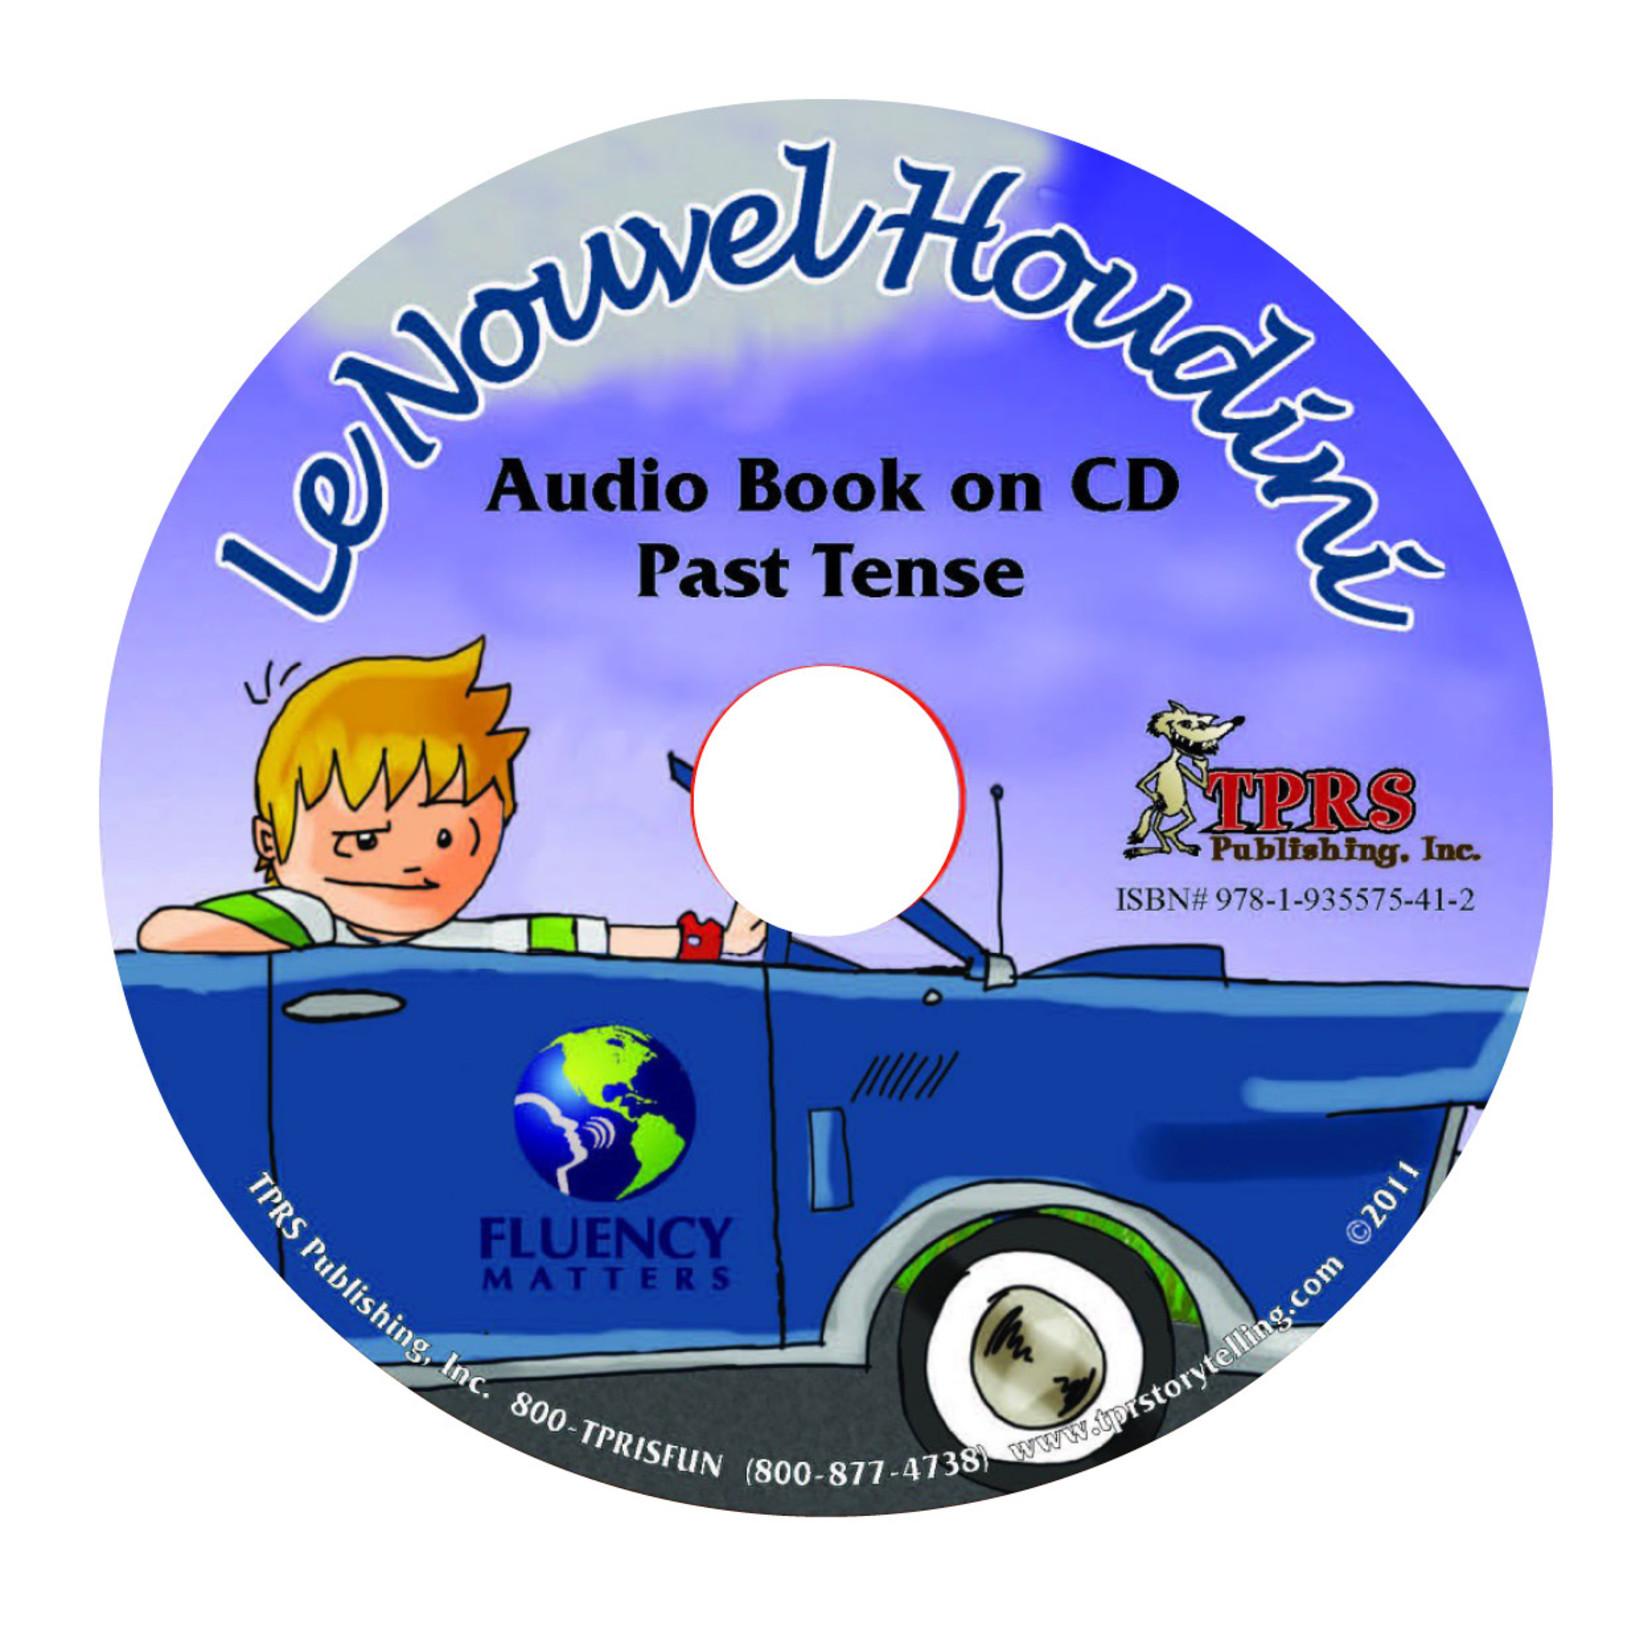 Fluency Matters Le nouvel Houdini - Luisterboek